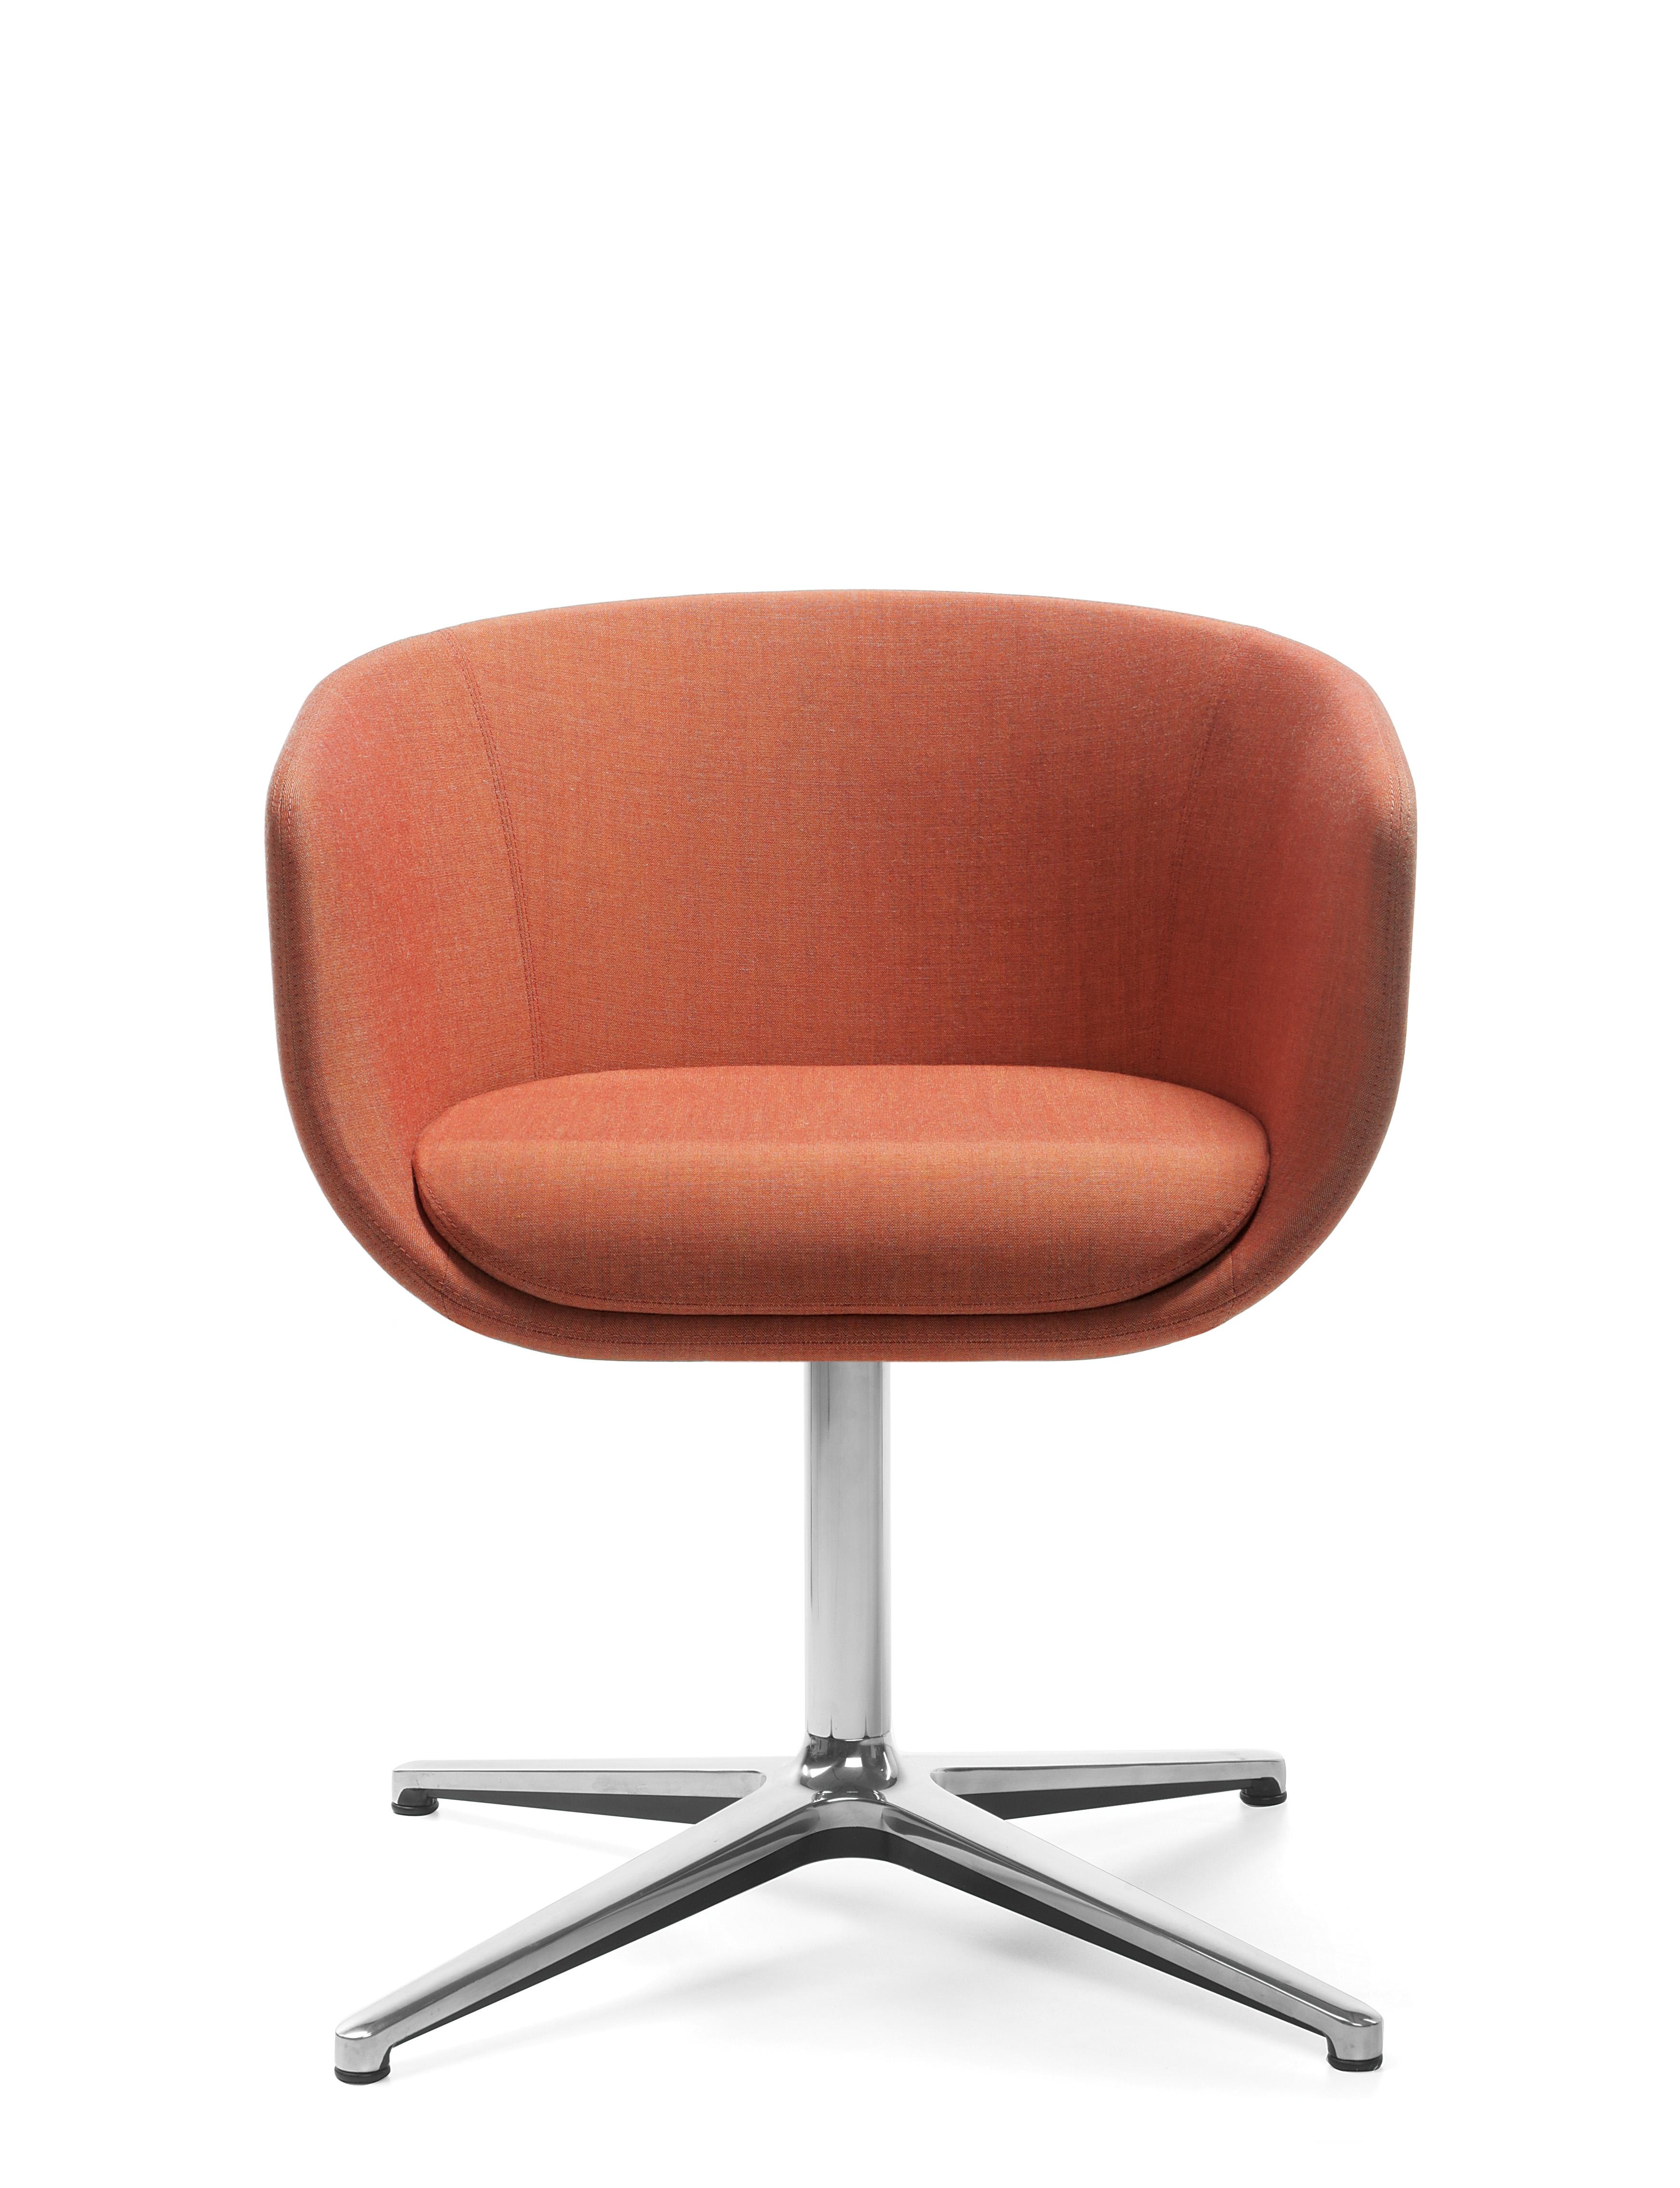 Nu krzesło biurowe Pokker Office